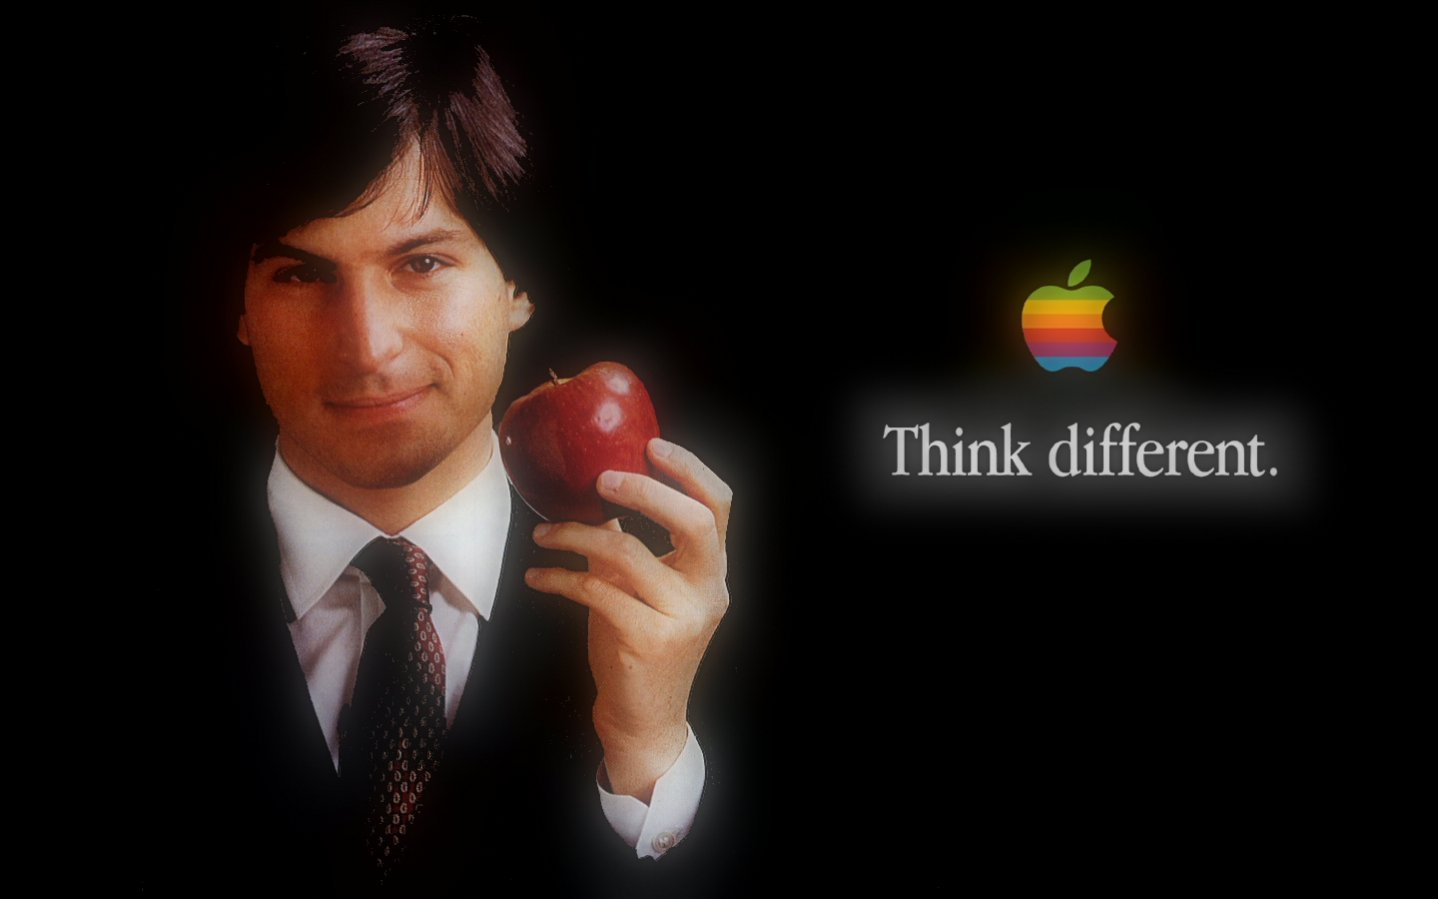 Approfondimento: l'eredità di Steve Jobs